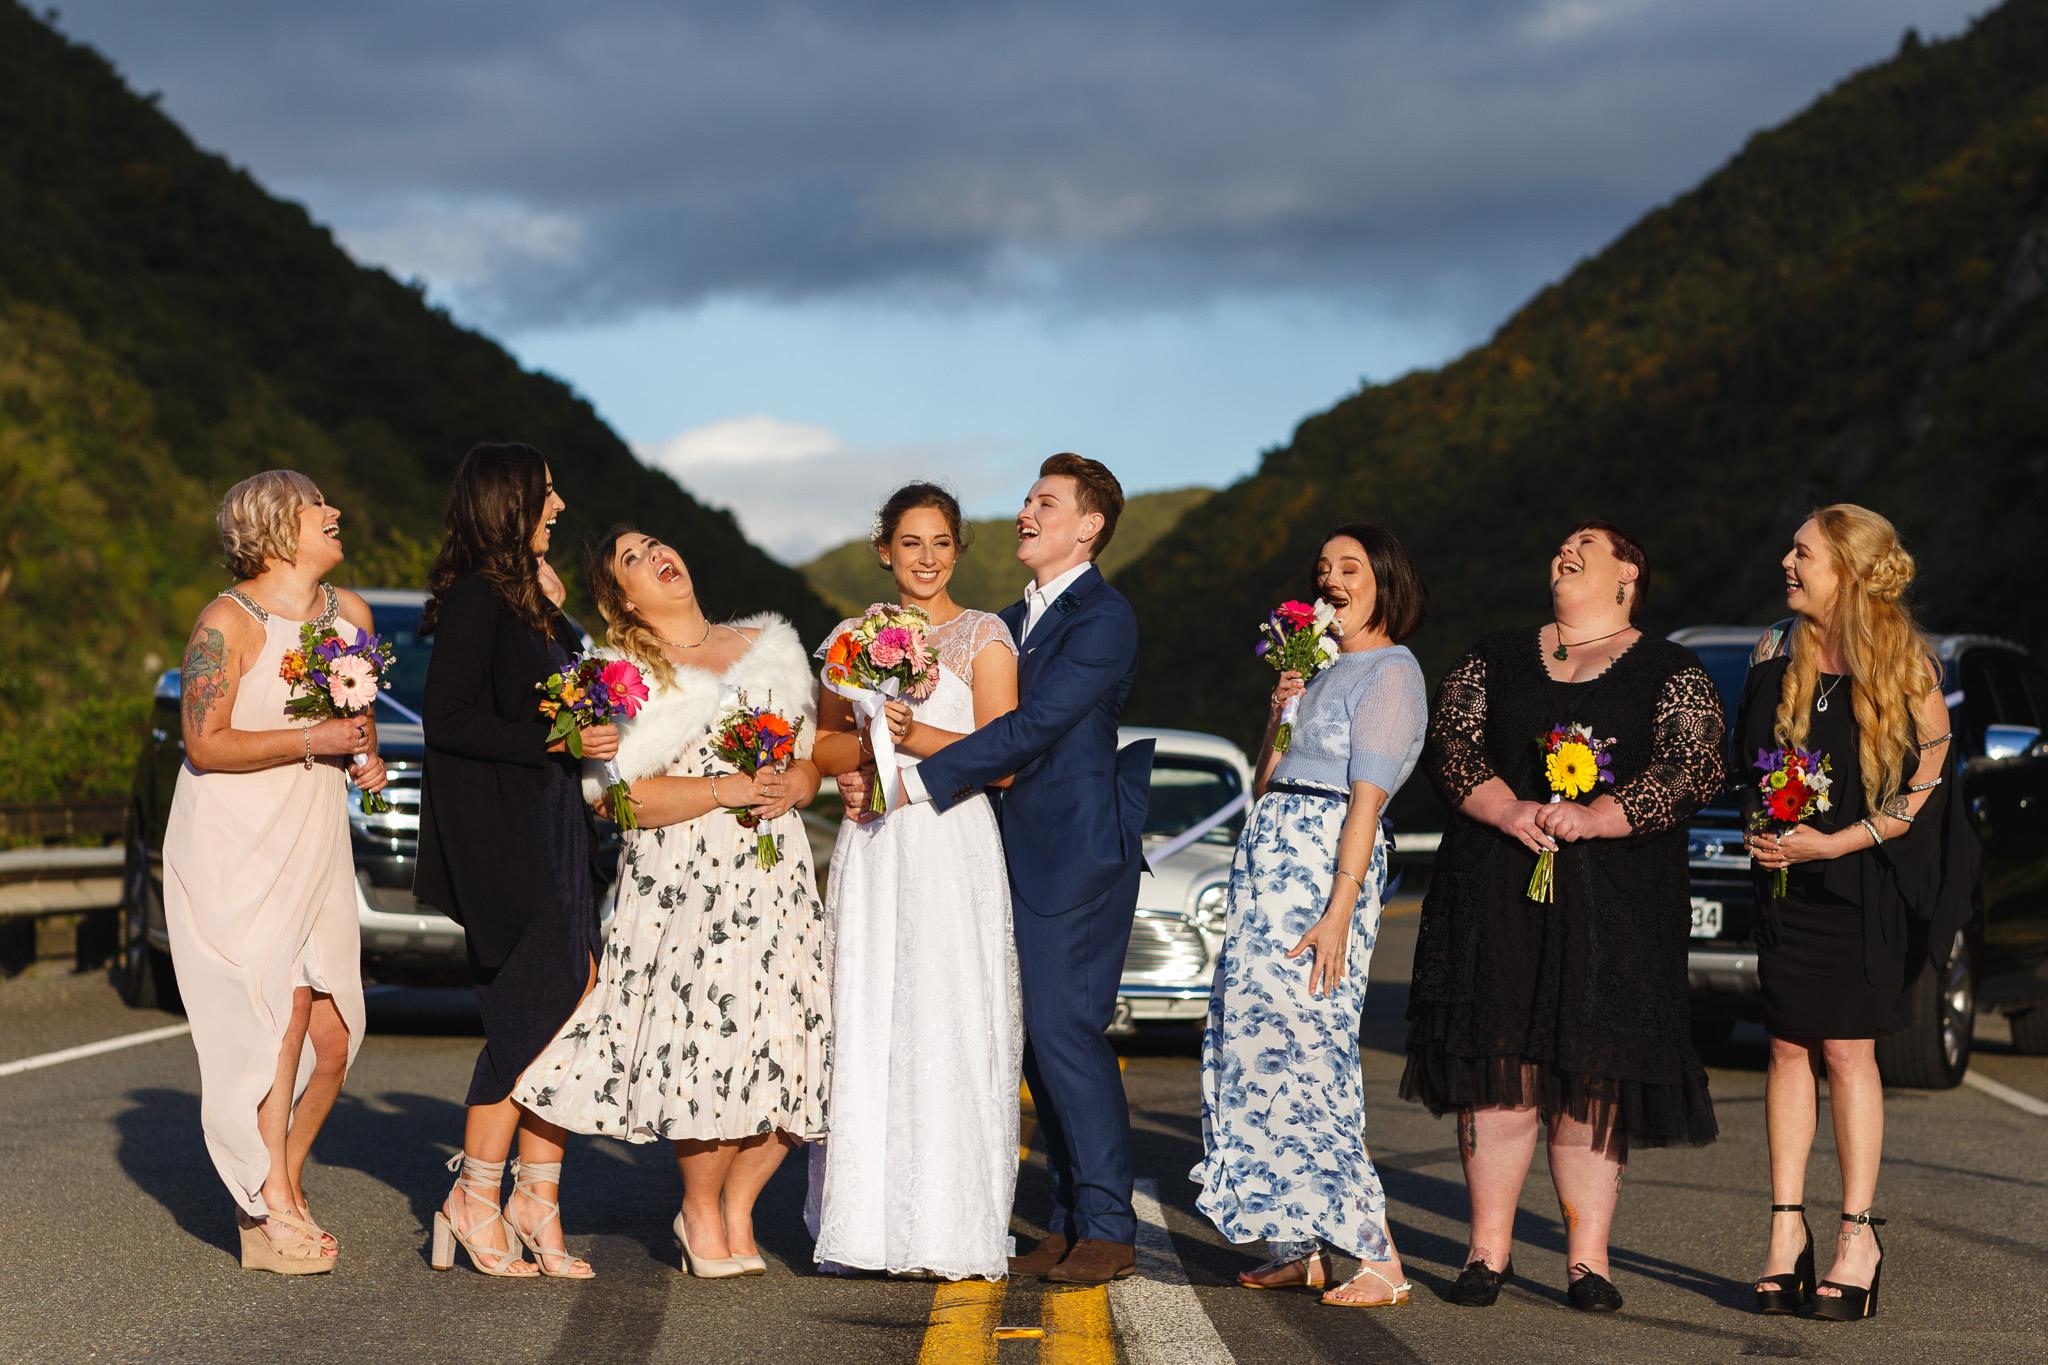 palmerston-north-wedding-photography-highlight-new-zealand.jpg-468.jpg